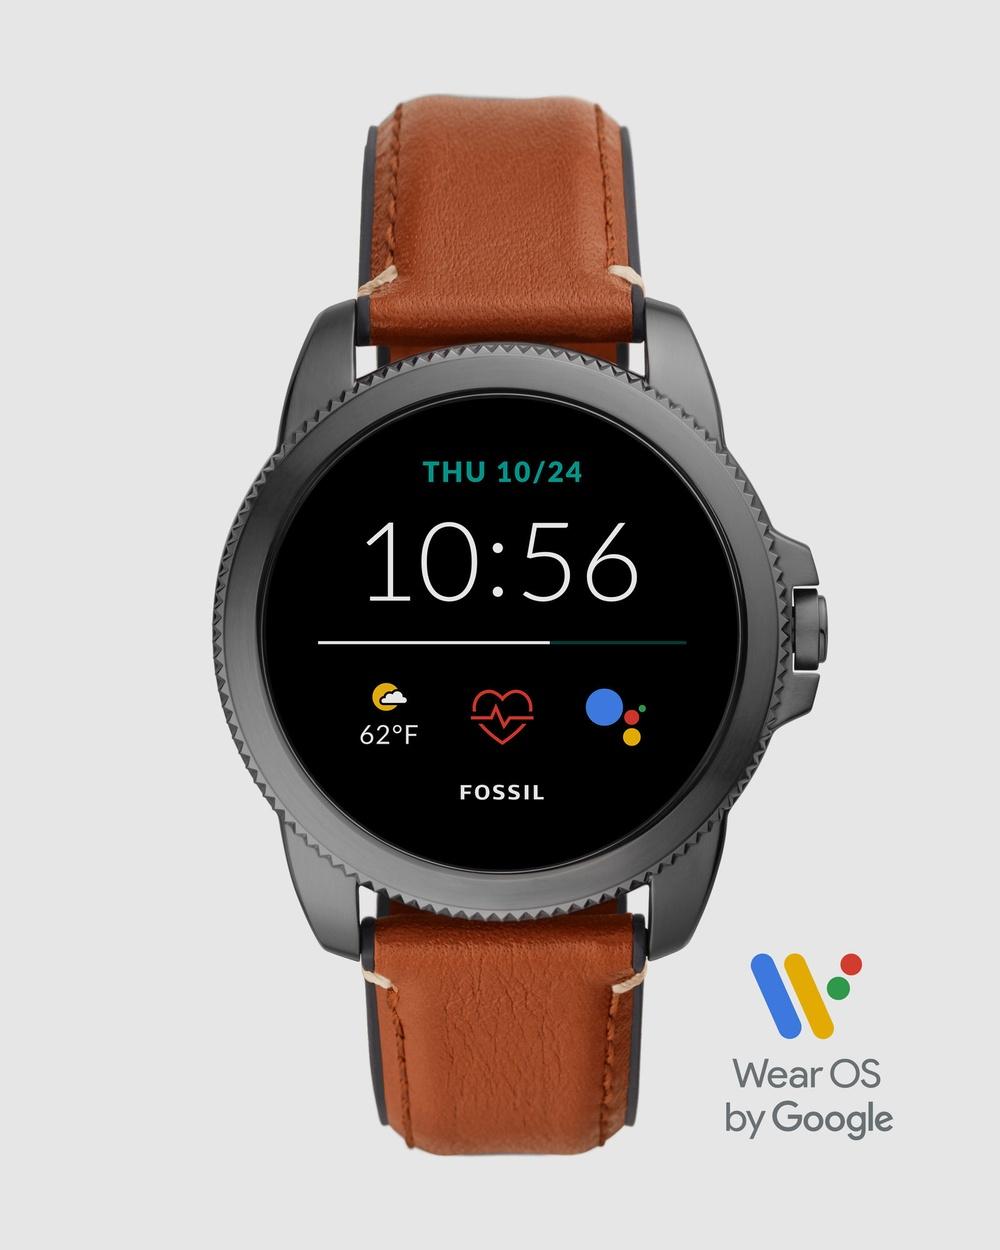 Fossil Gen 5E Brown Smartwatch Smart Watches Brown